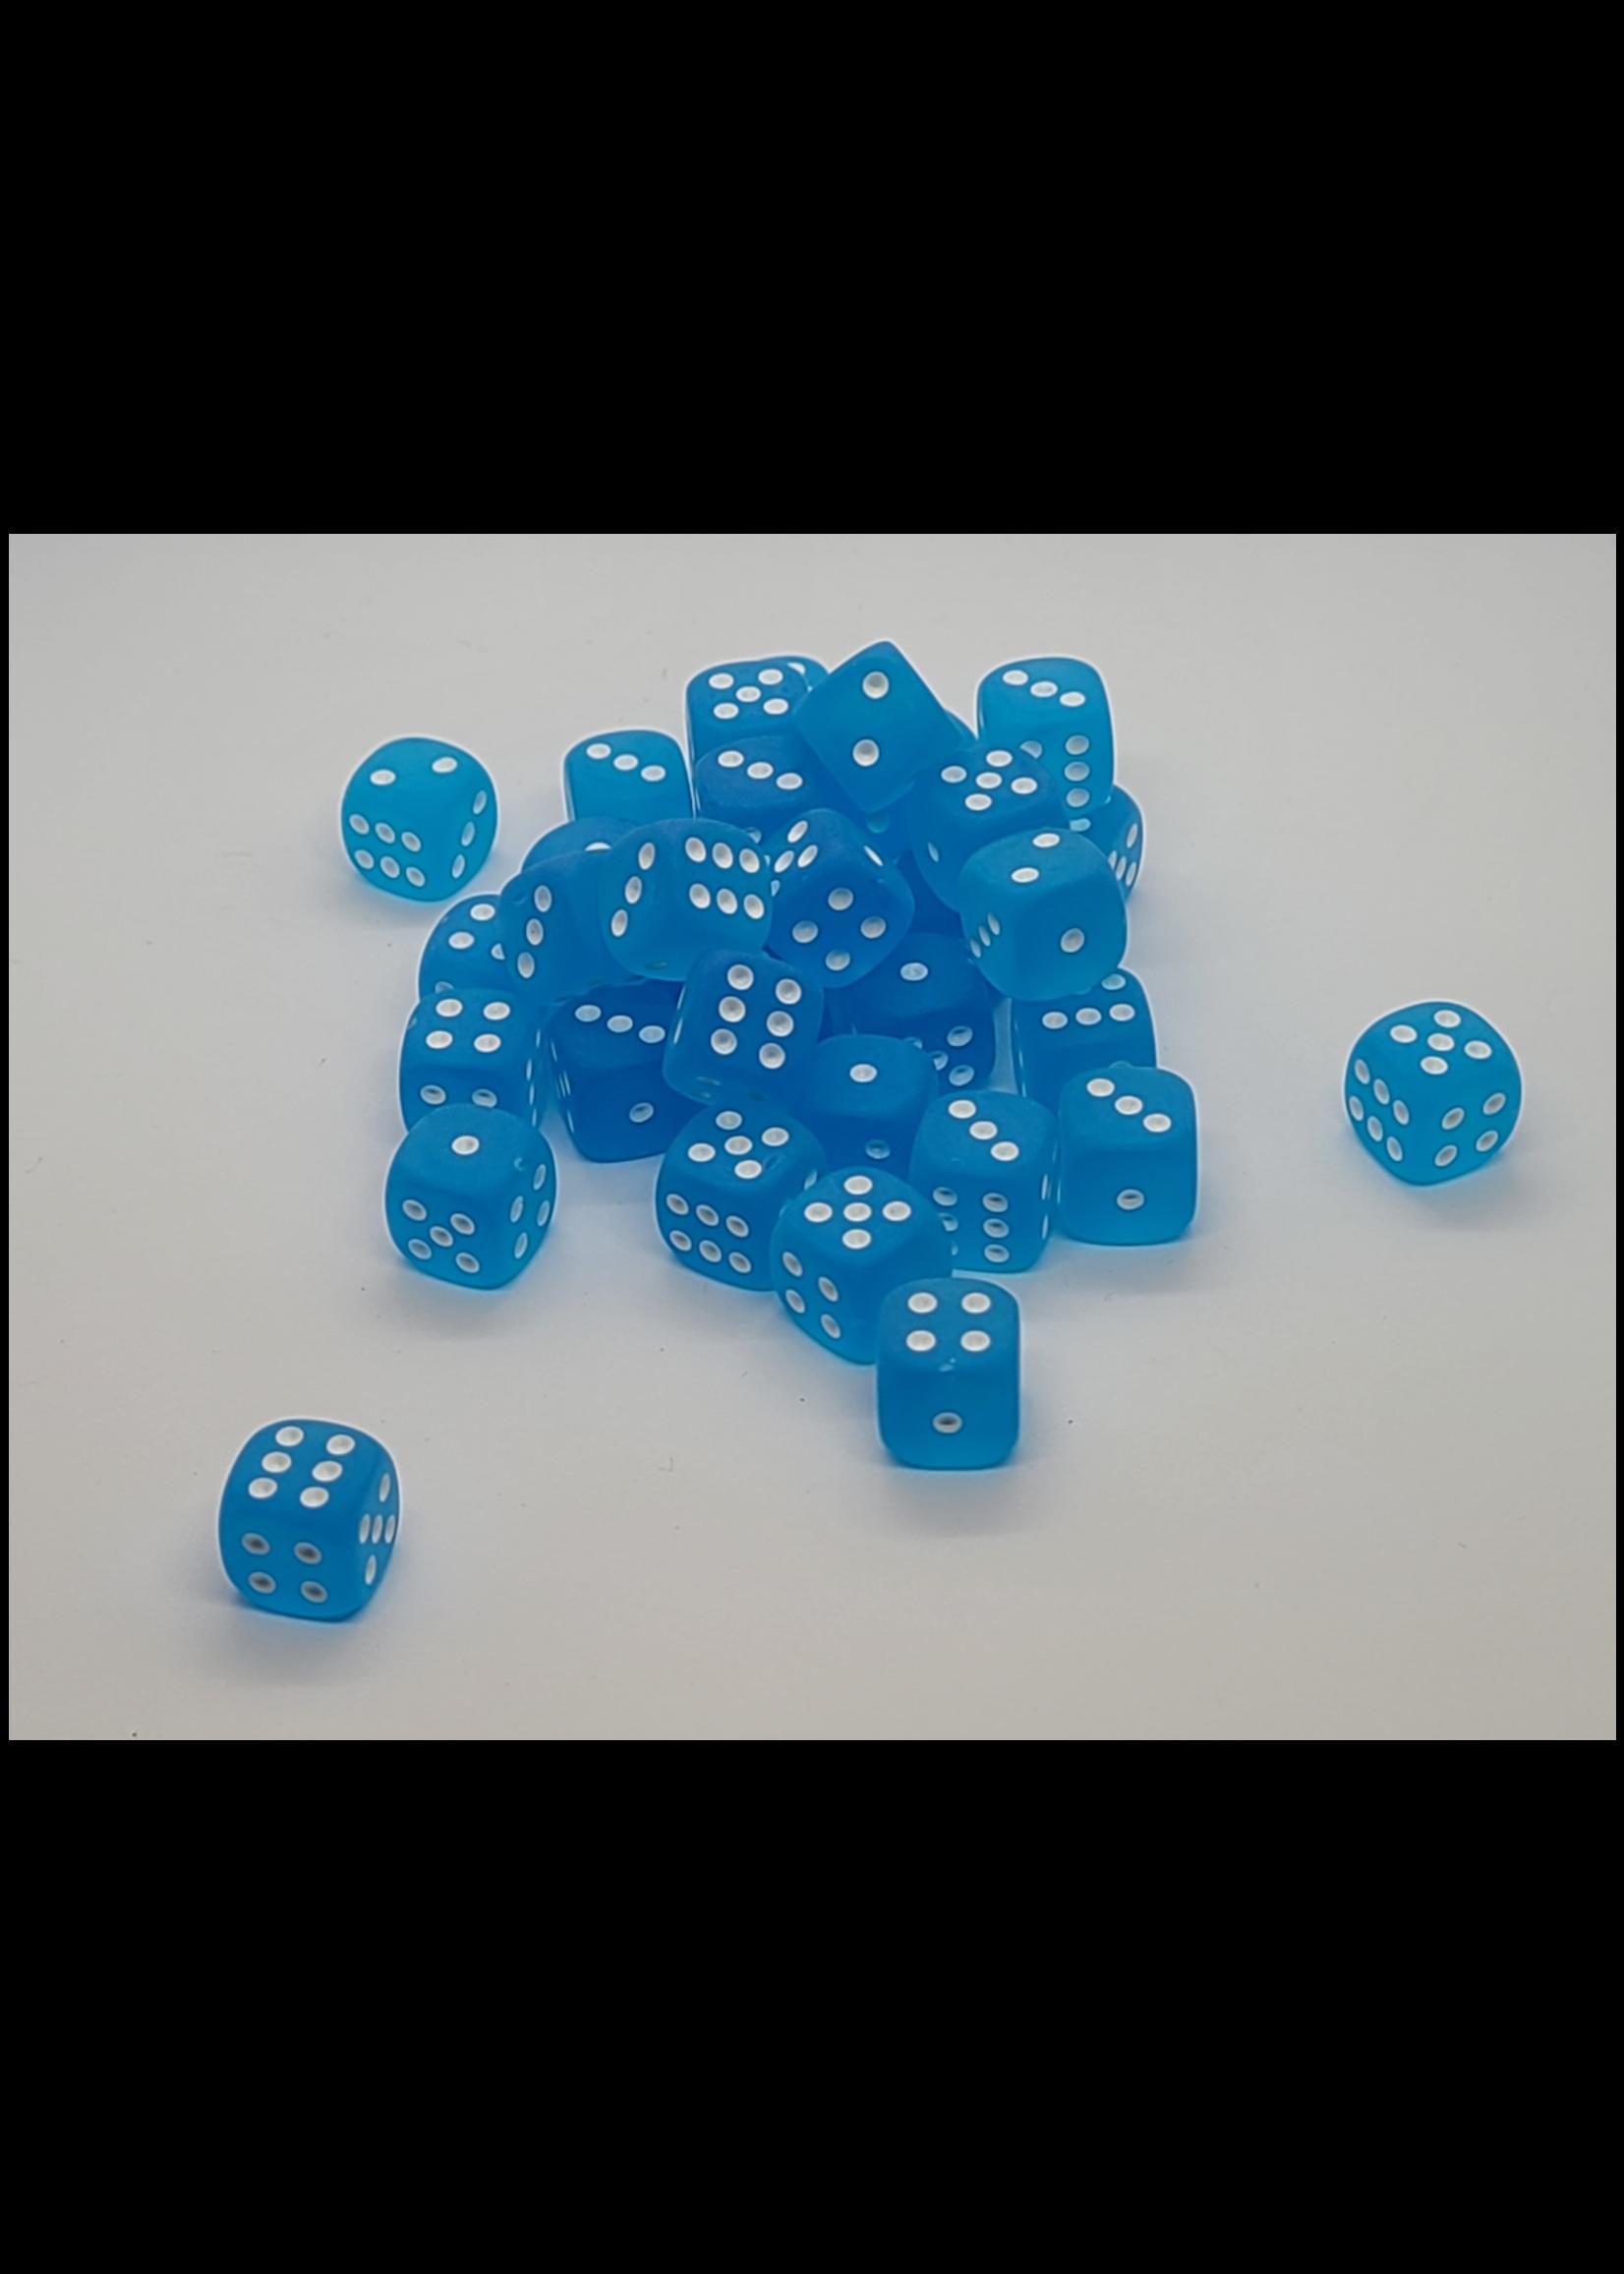 Chessex Chessex Dice - 36 - d6 12mm